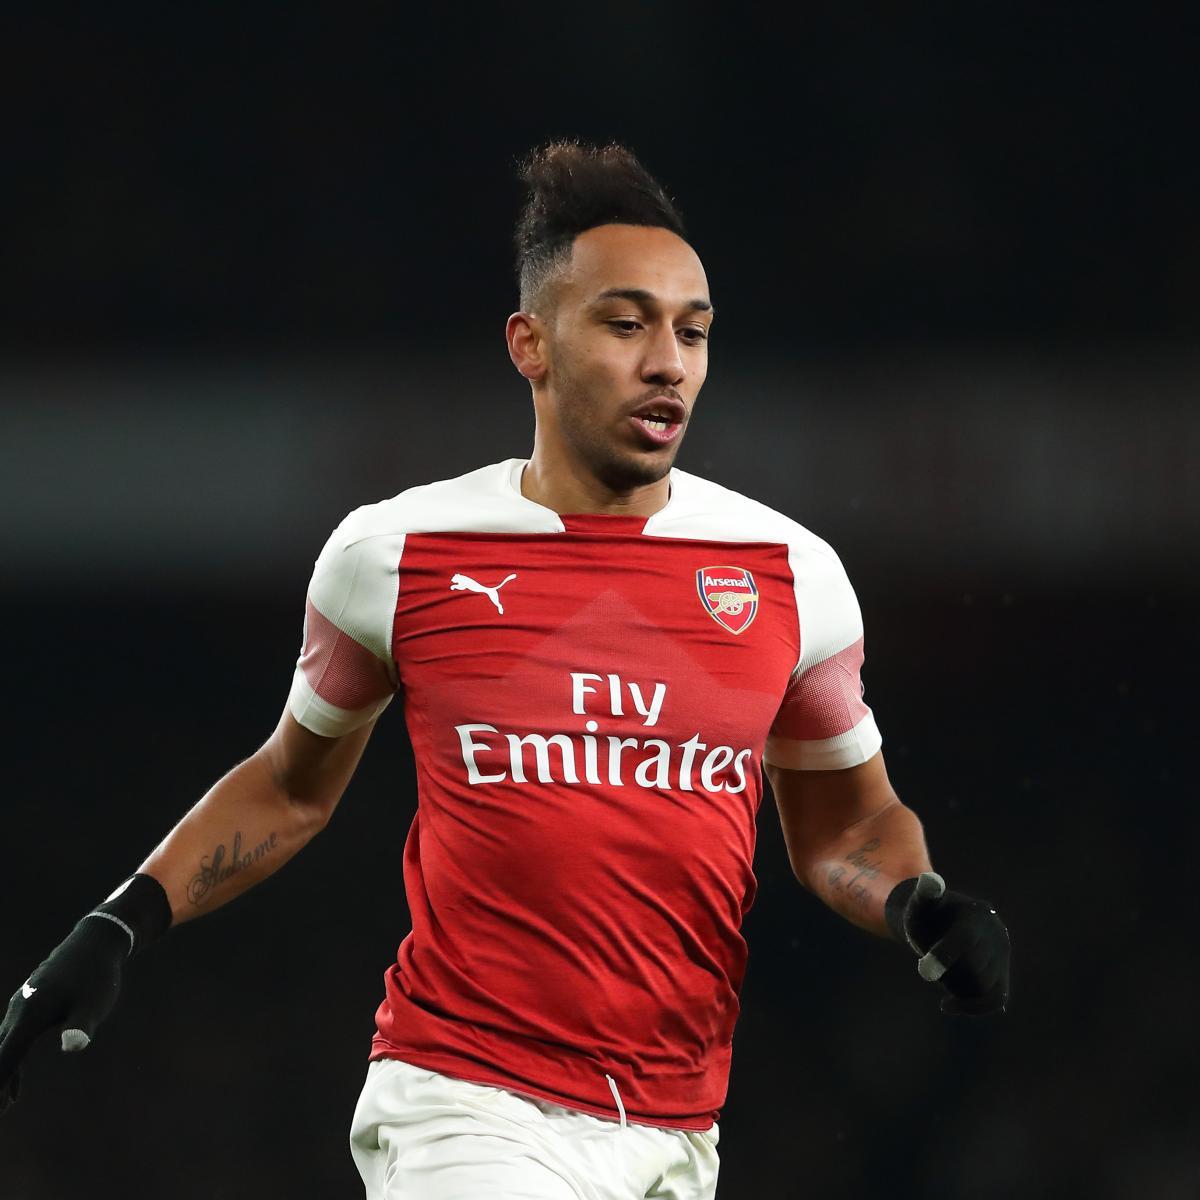 Arsenal Vs. Cardiff City: Odds, Preview, Live Stream, TV